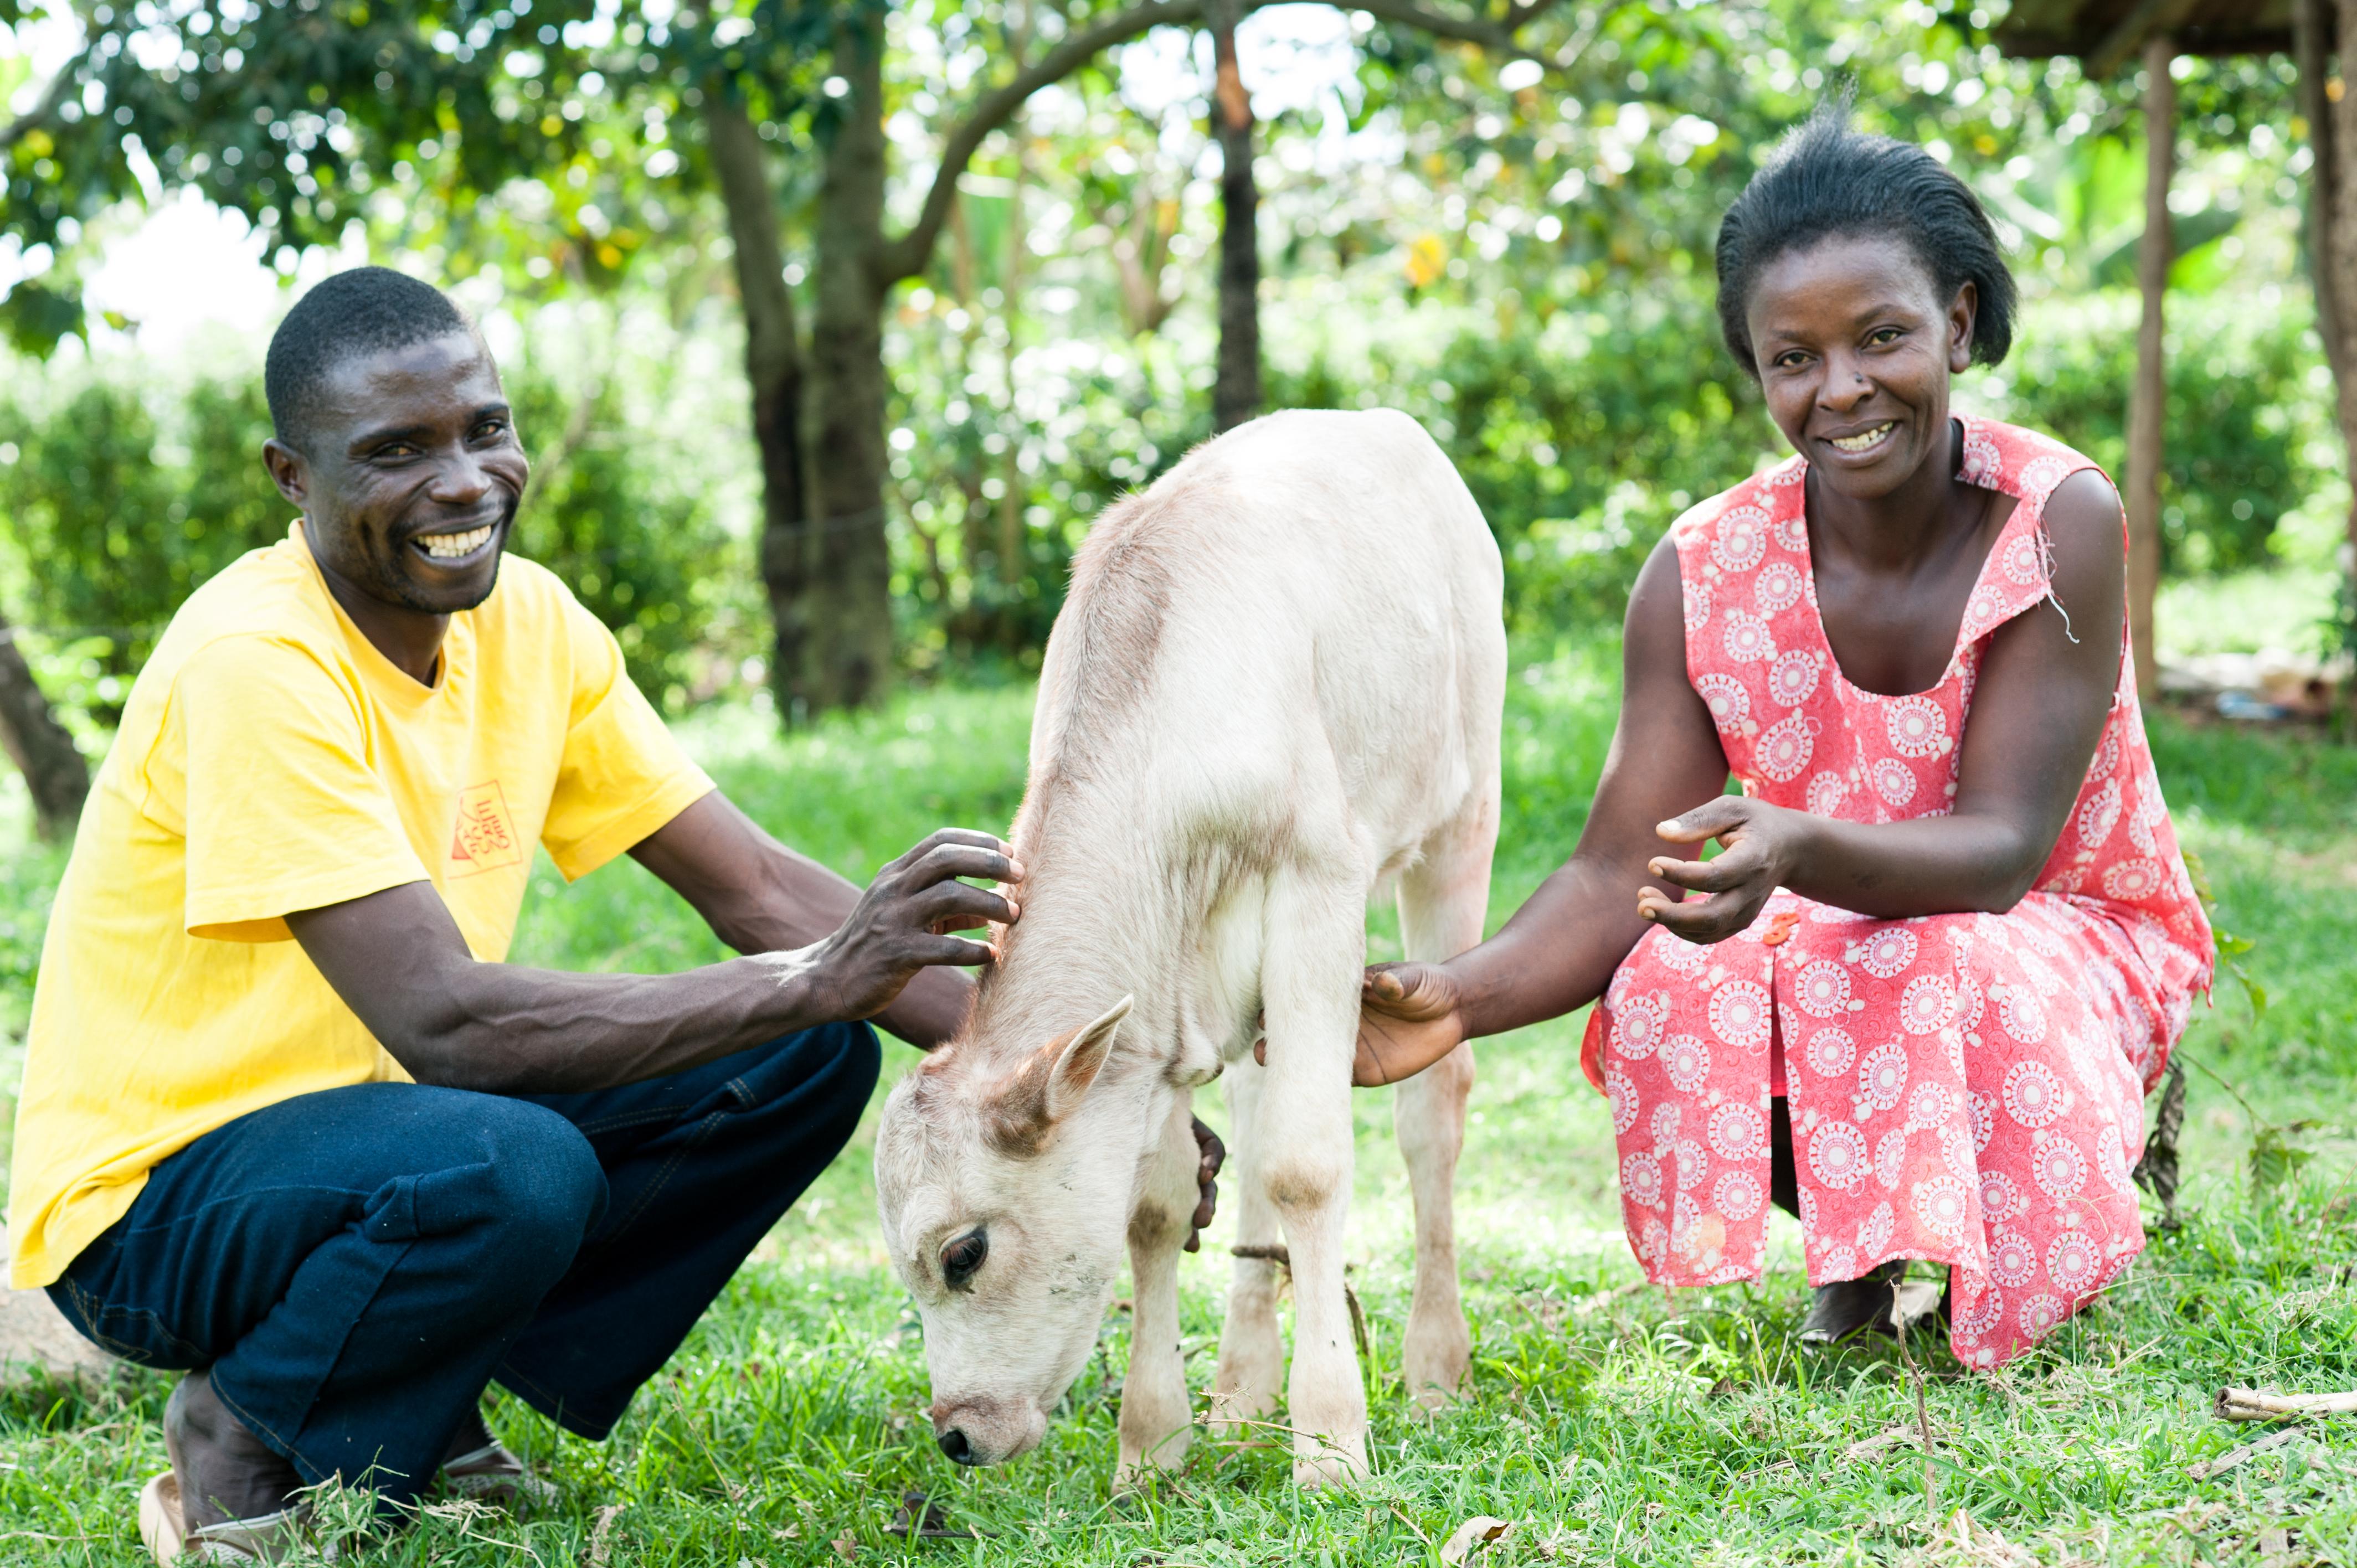 Kenyan harvest: happy children, a new business and a wedding celebration